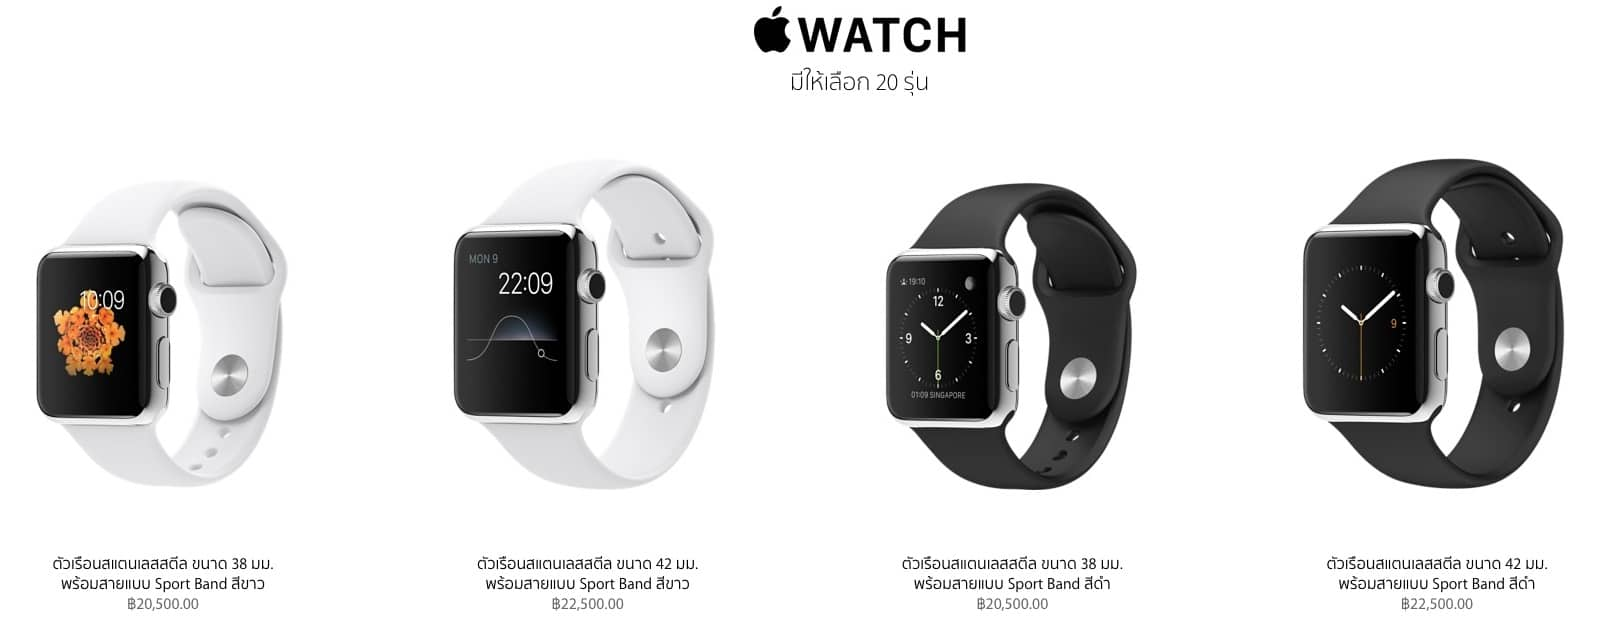 Apple watch review sport oneplus one 64gb купить киев